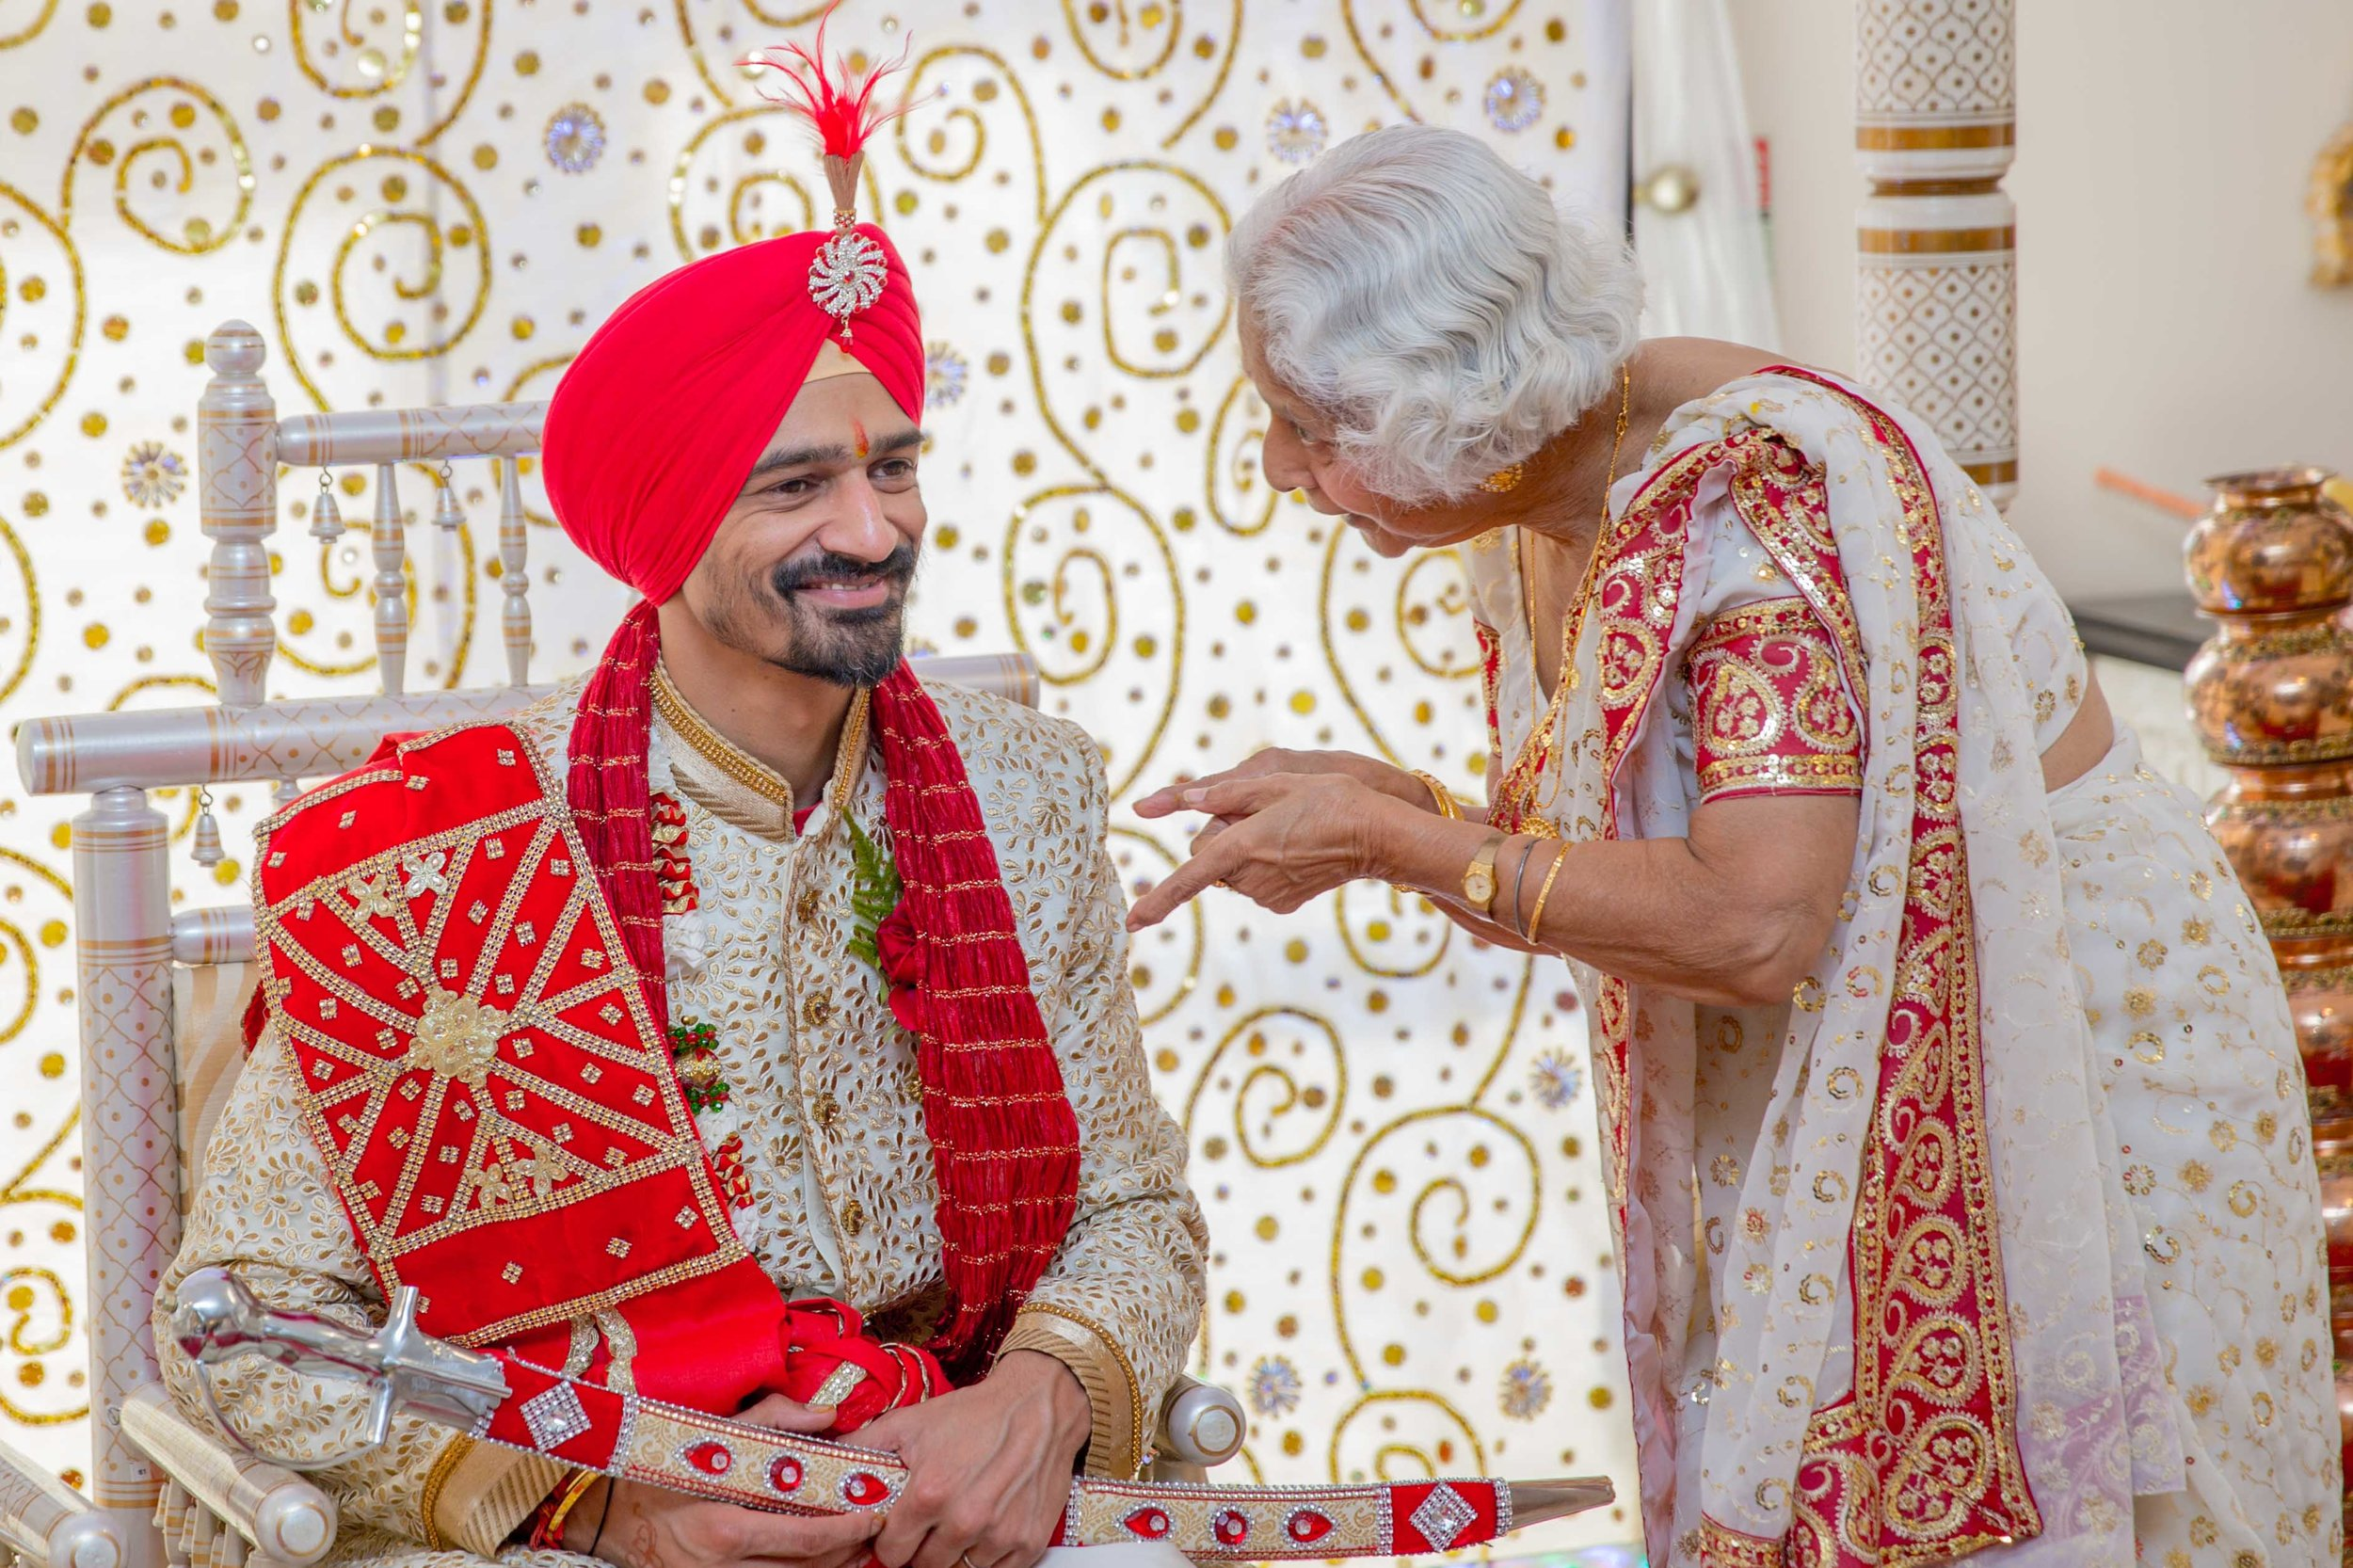 ramada-park-hall-hotel-birmingham-wolverhampton-hindu-wedding-asian-wedding-photography-natalia-smith-photography-19.jpg